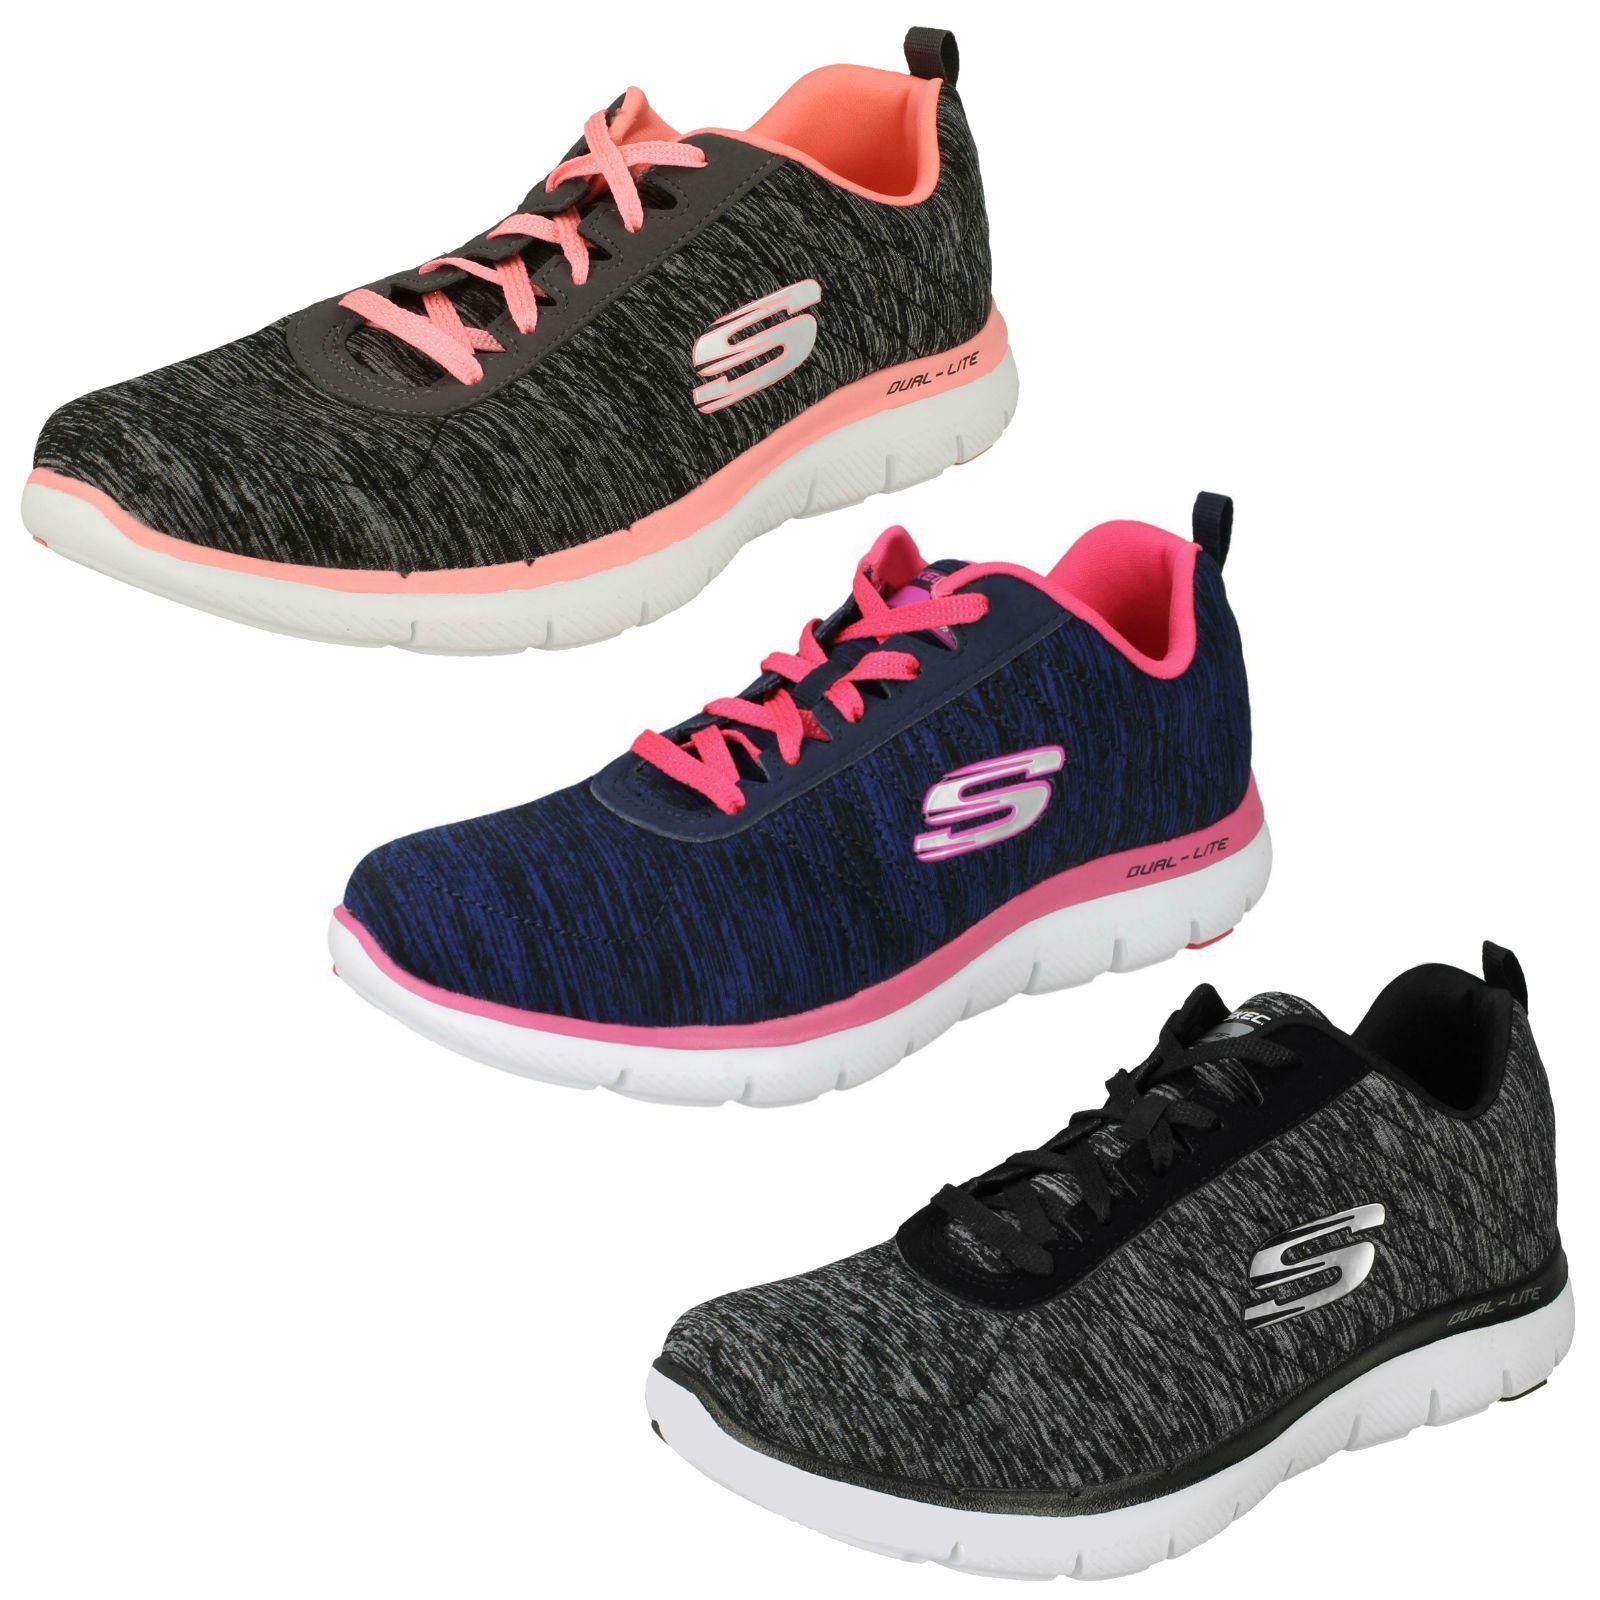 Ladies Skechers Memory Foam Trainers Flex Appeal - 2.0 12753